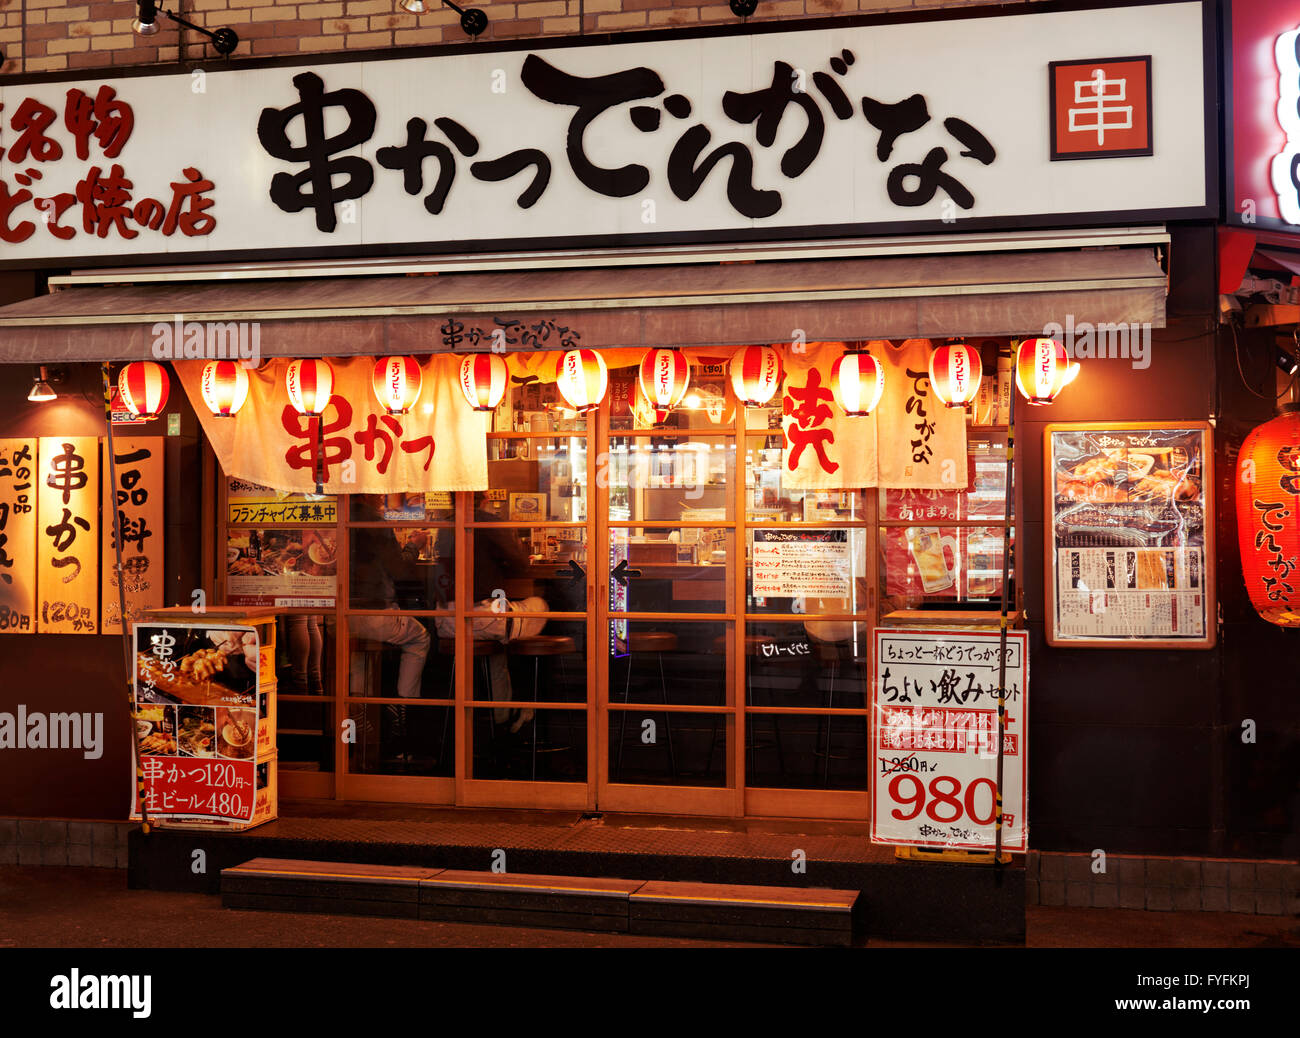 Japanese restaurant, Shinjuku, Tokyo, Japan - Stock Image